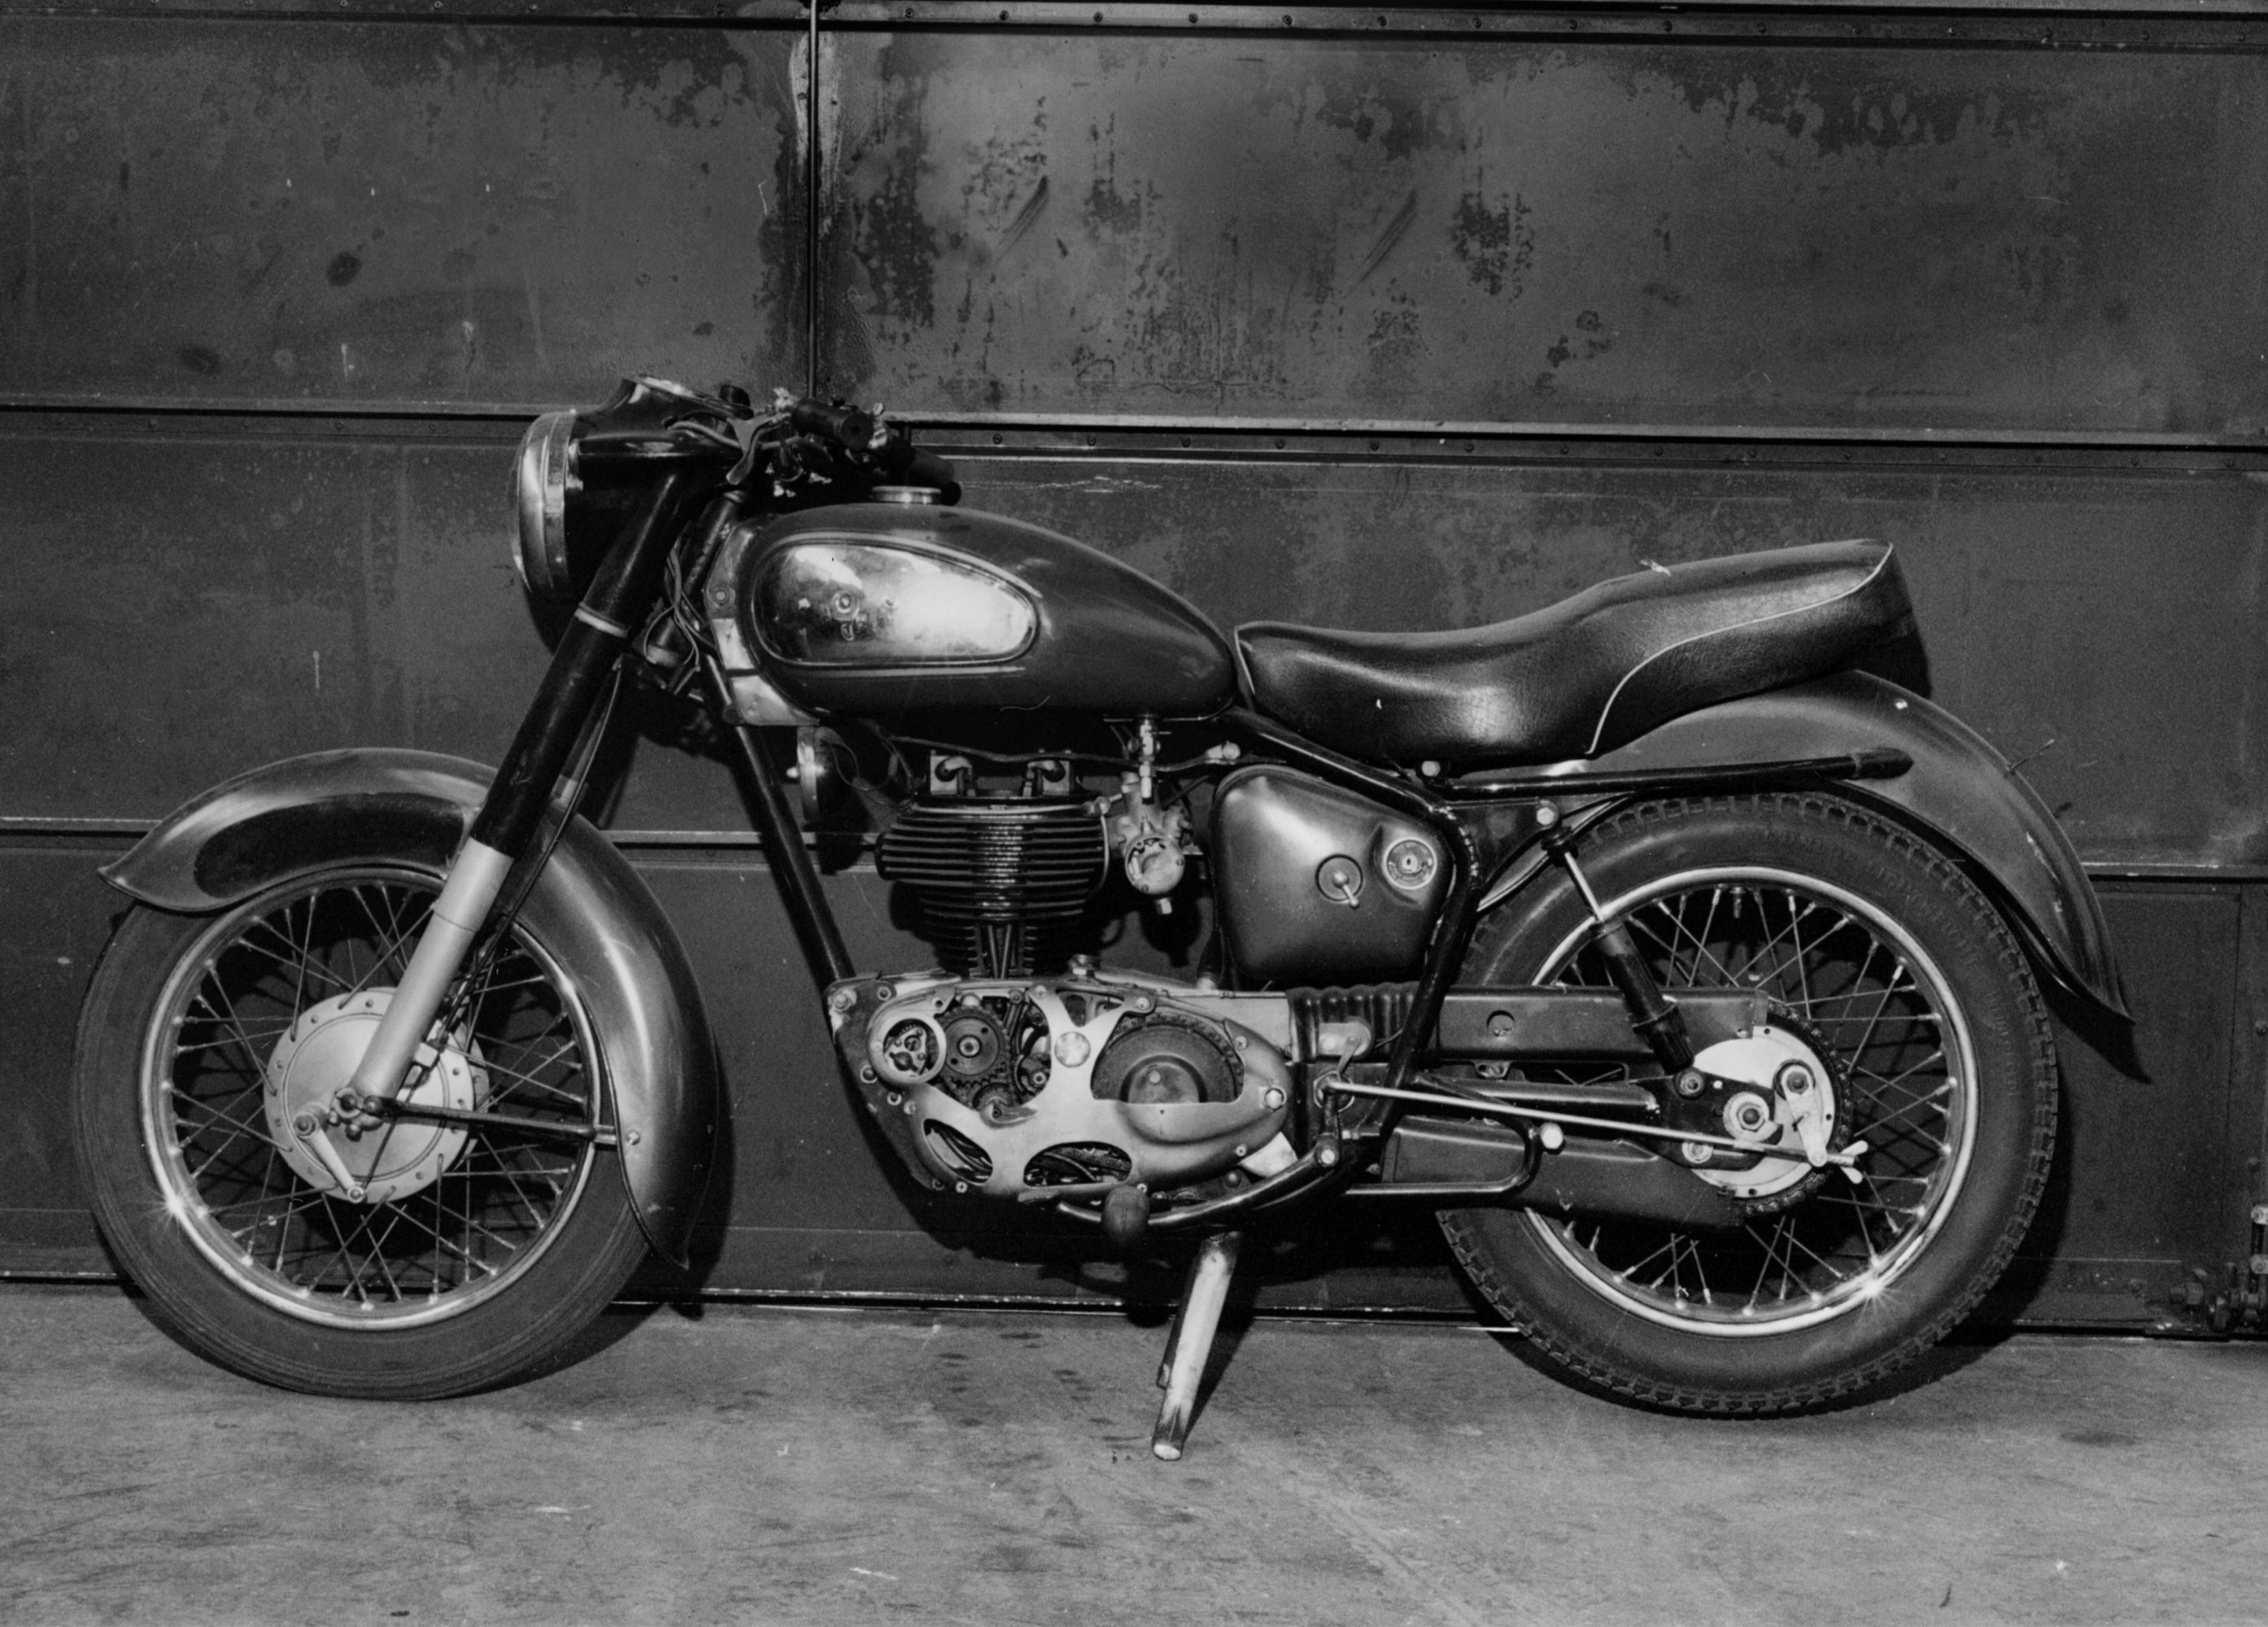 Royal Enfield Crusader - The National Motor Museum Trust